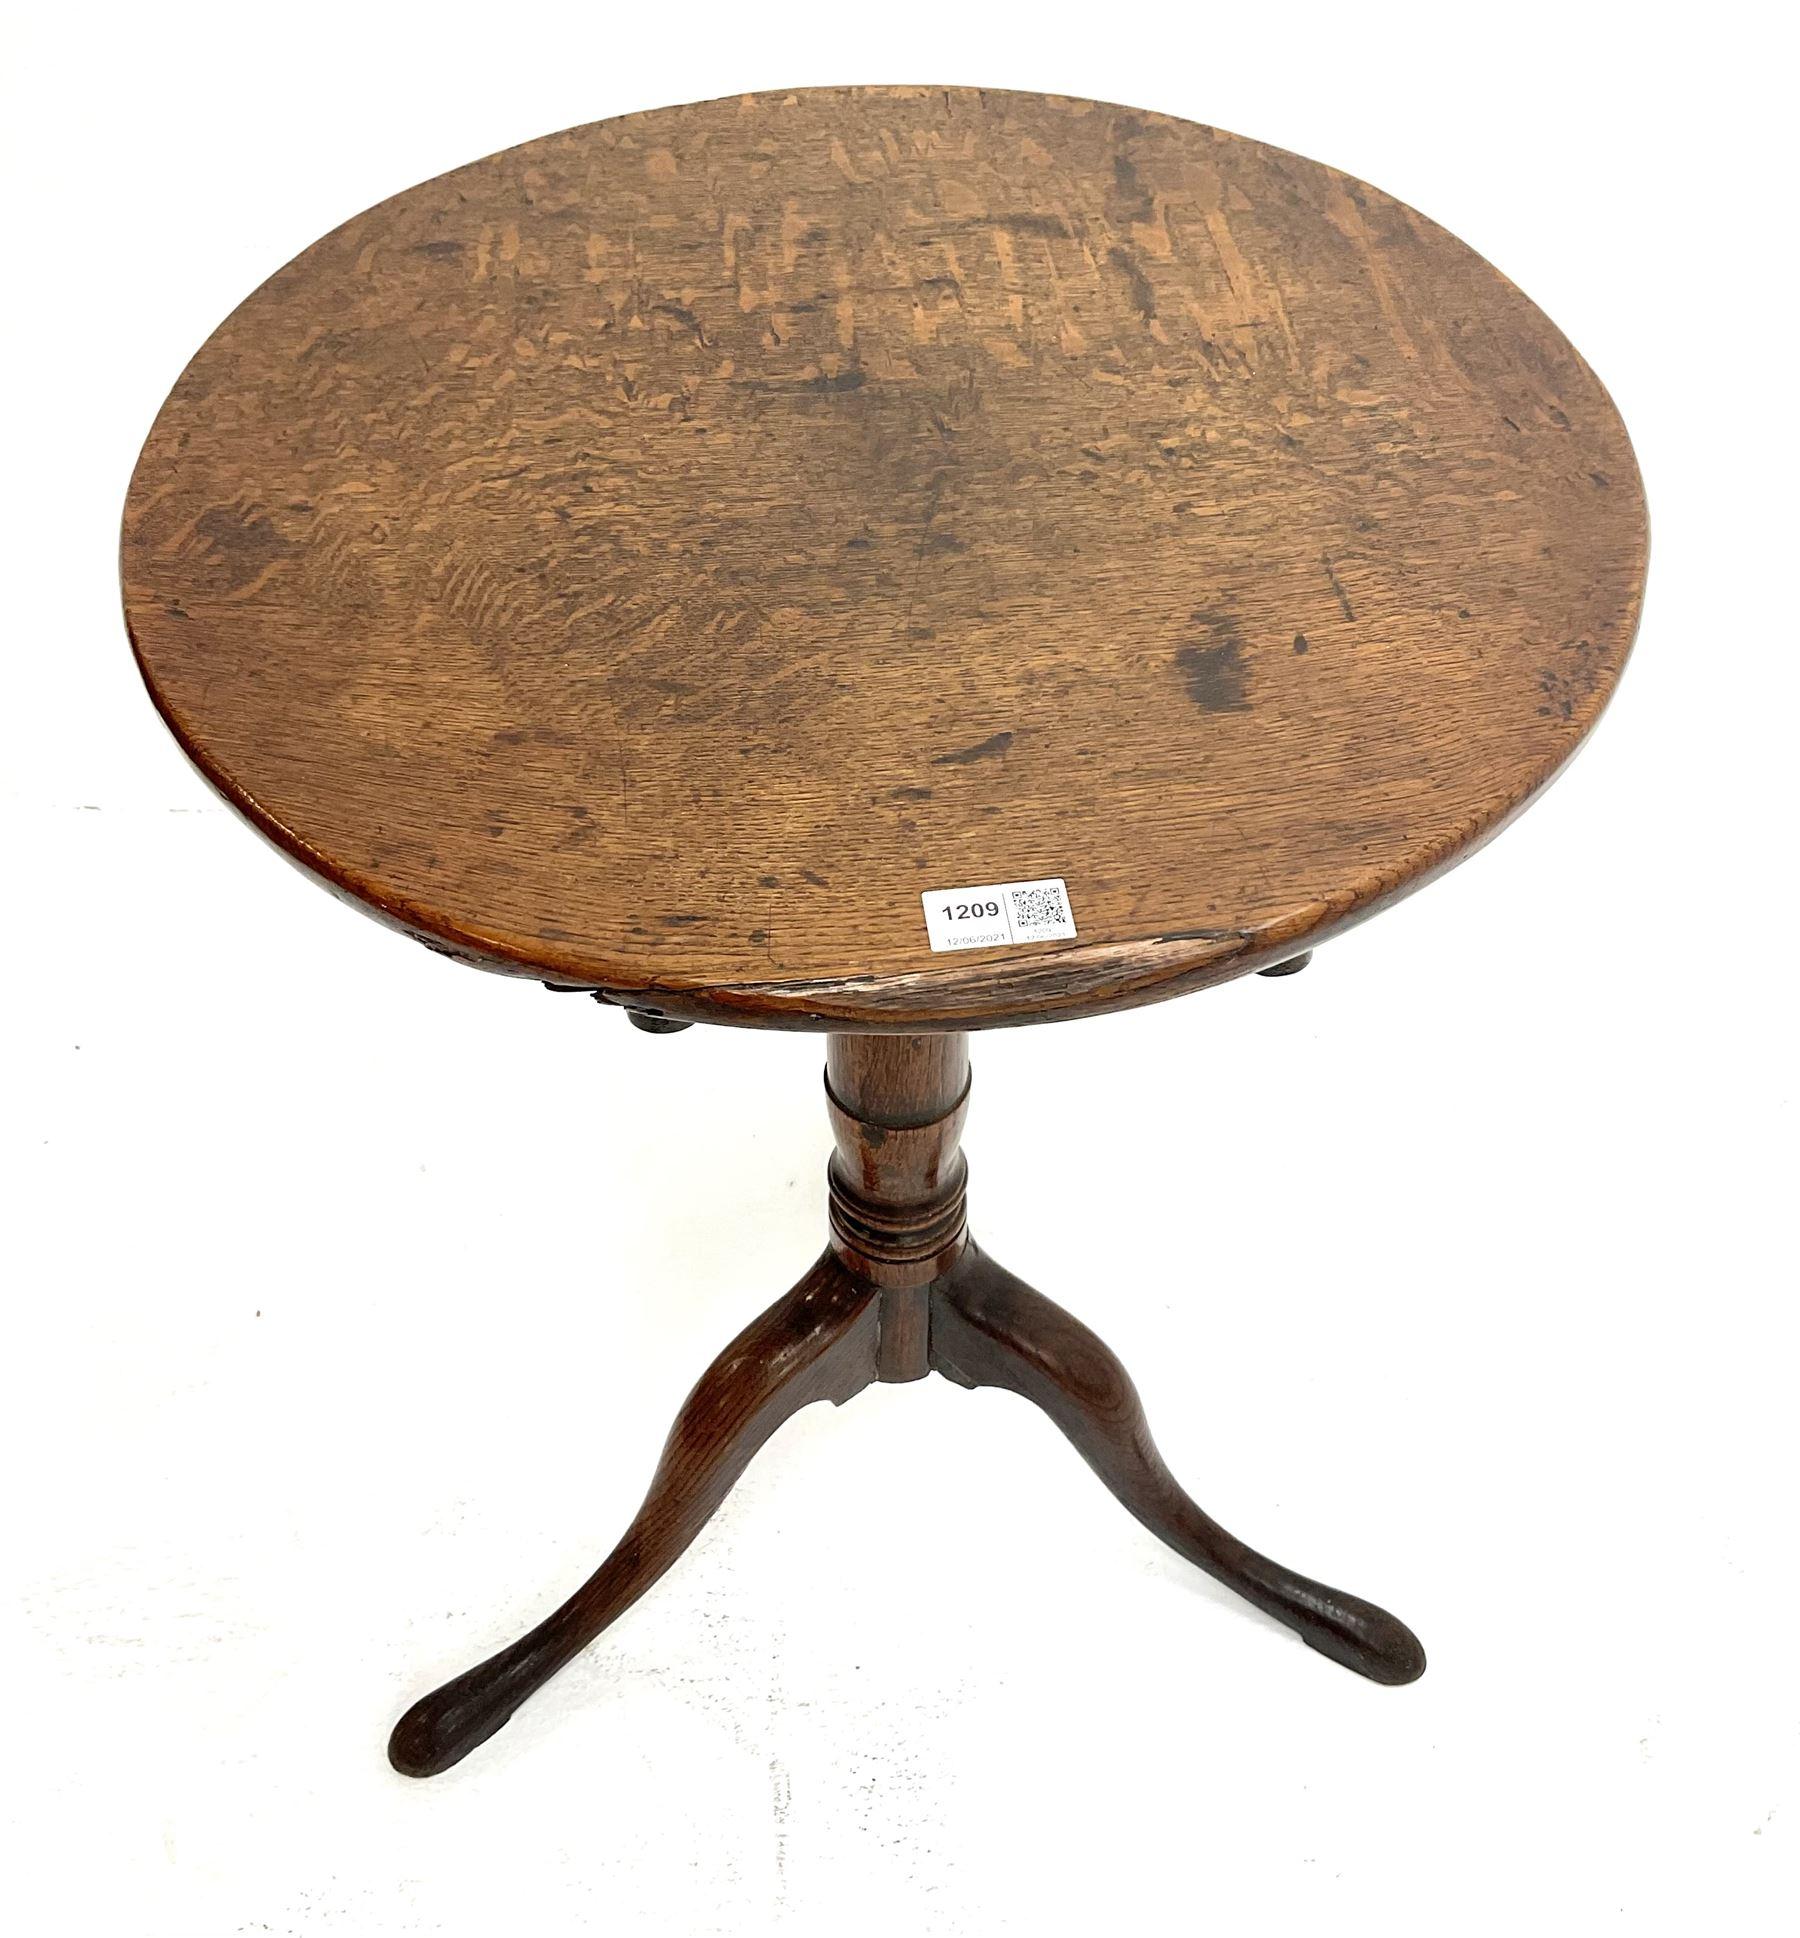 Georgian country oak tripod table - Image 2 of 3